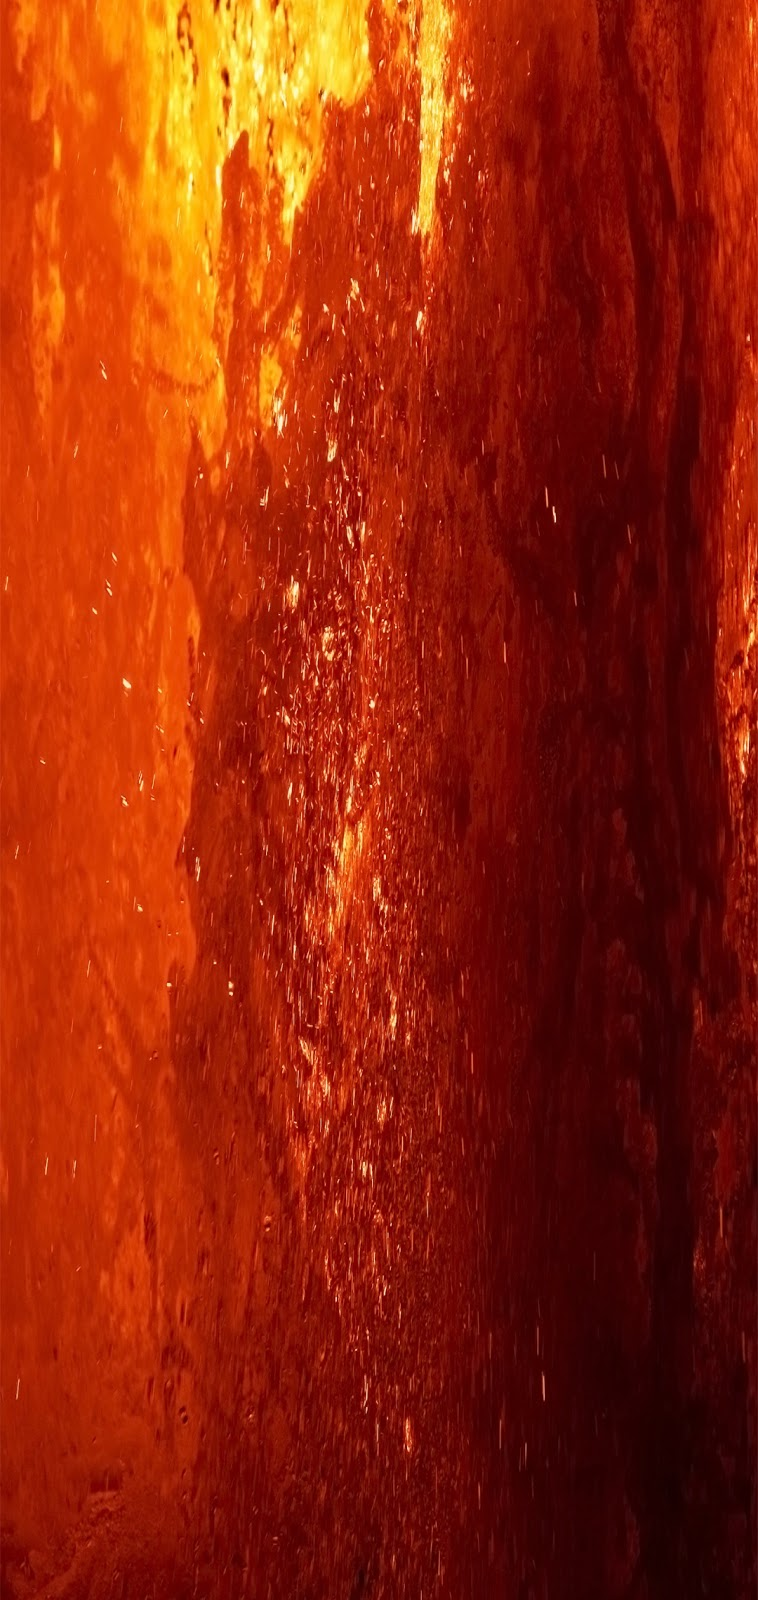 wallpaper-nokia-8.1